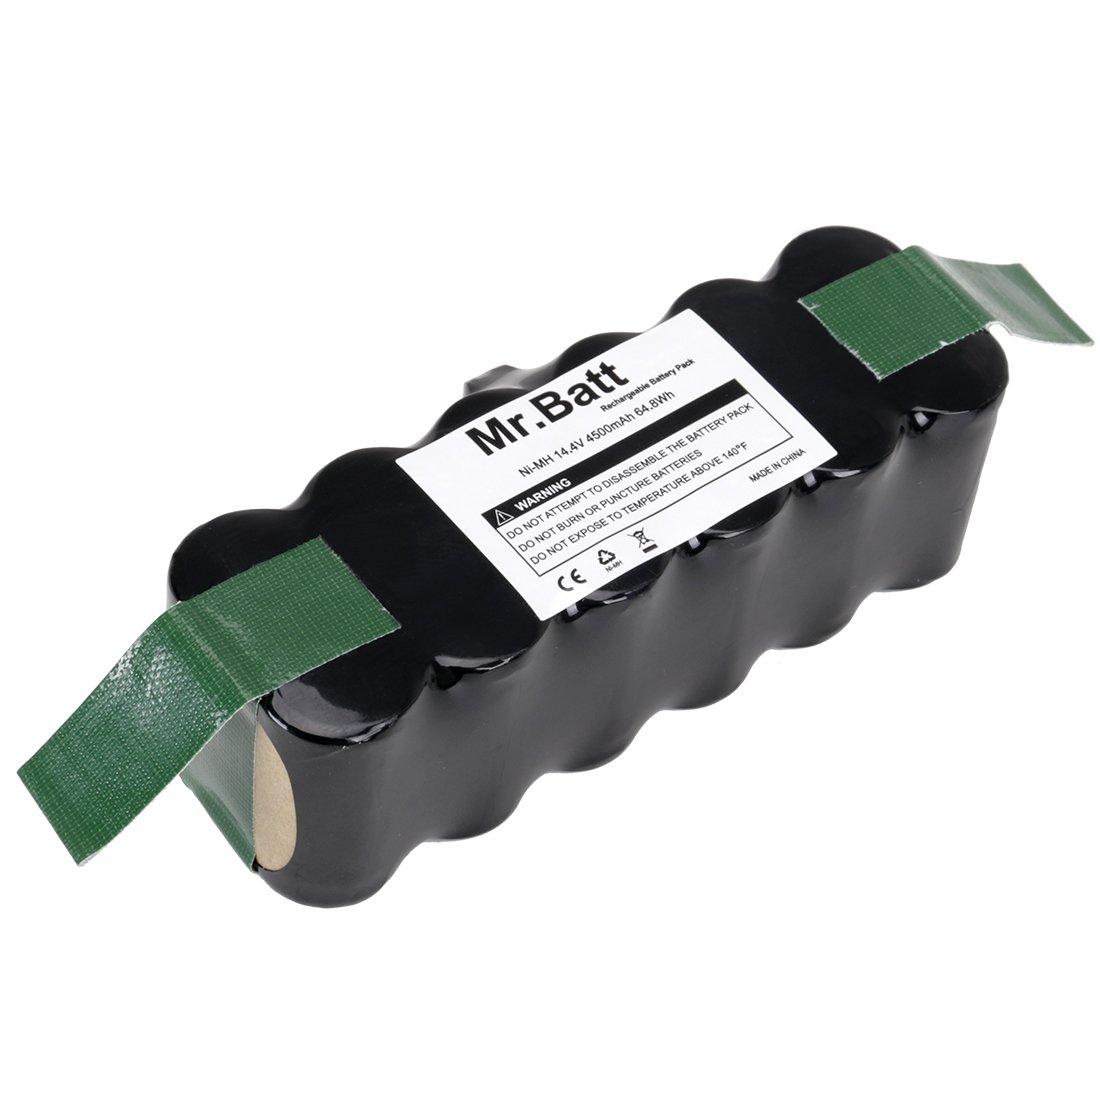 Mr.Batt 4500mAh High Capacity Ni-MH Replacement Battery for iRobot Roomba 500 600 700 800 Series Robot Vacuums